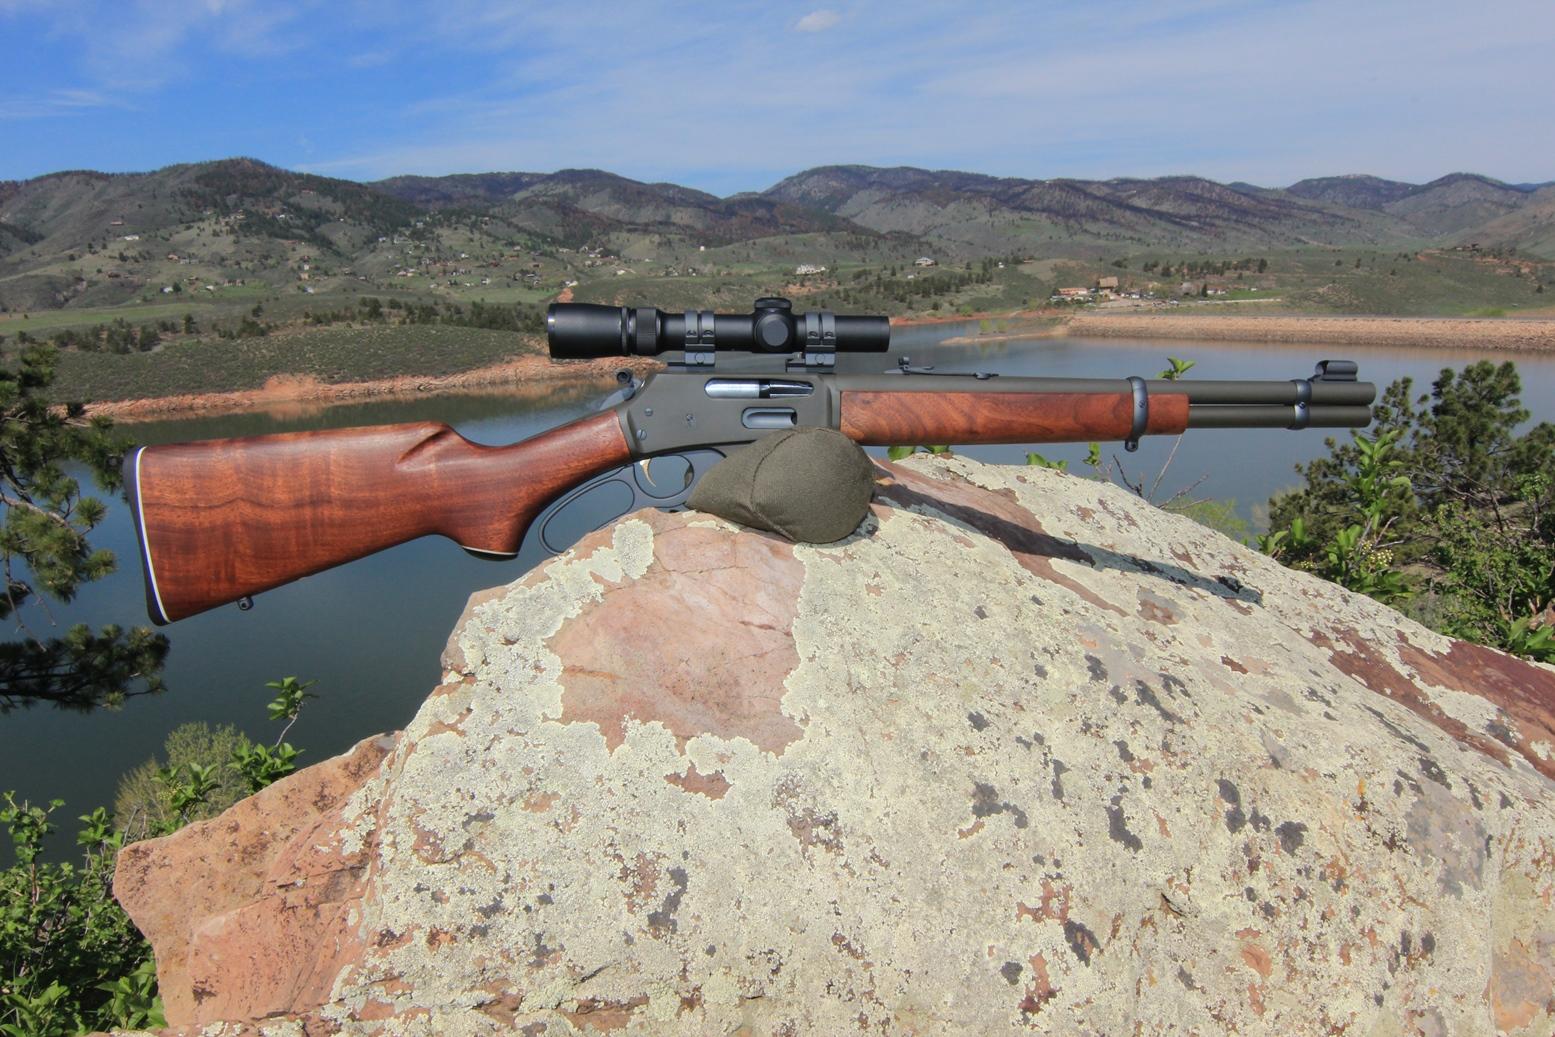 1600 3030 rifle